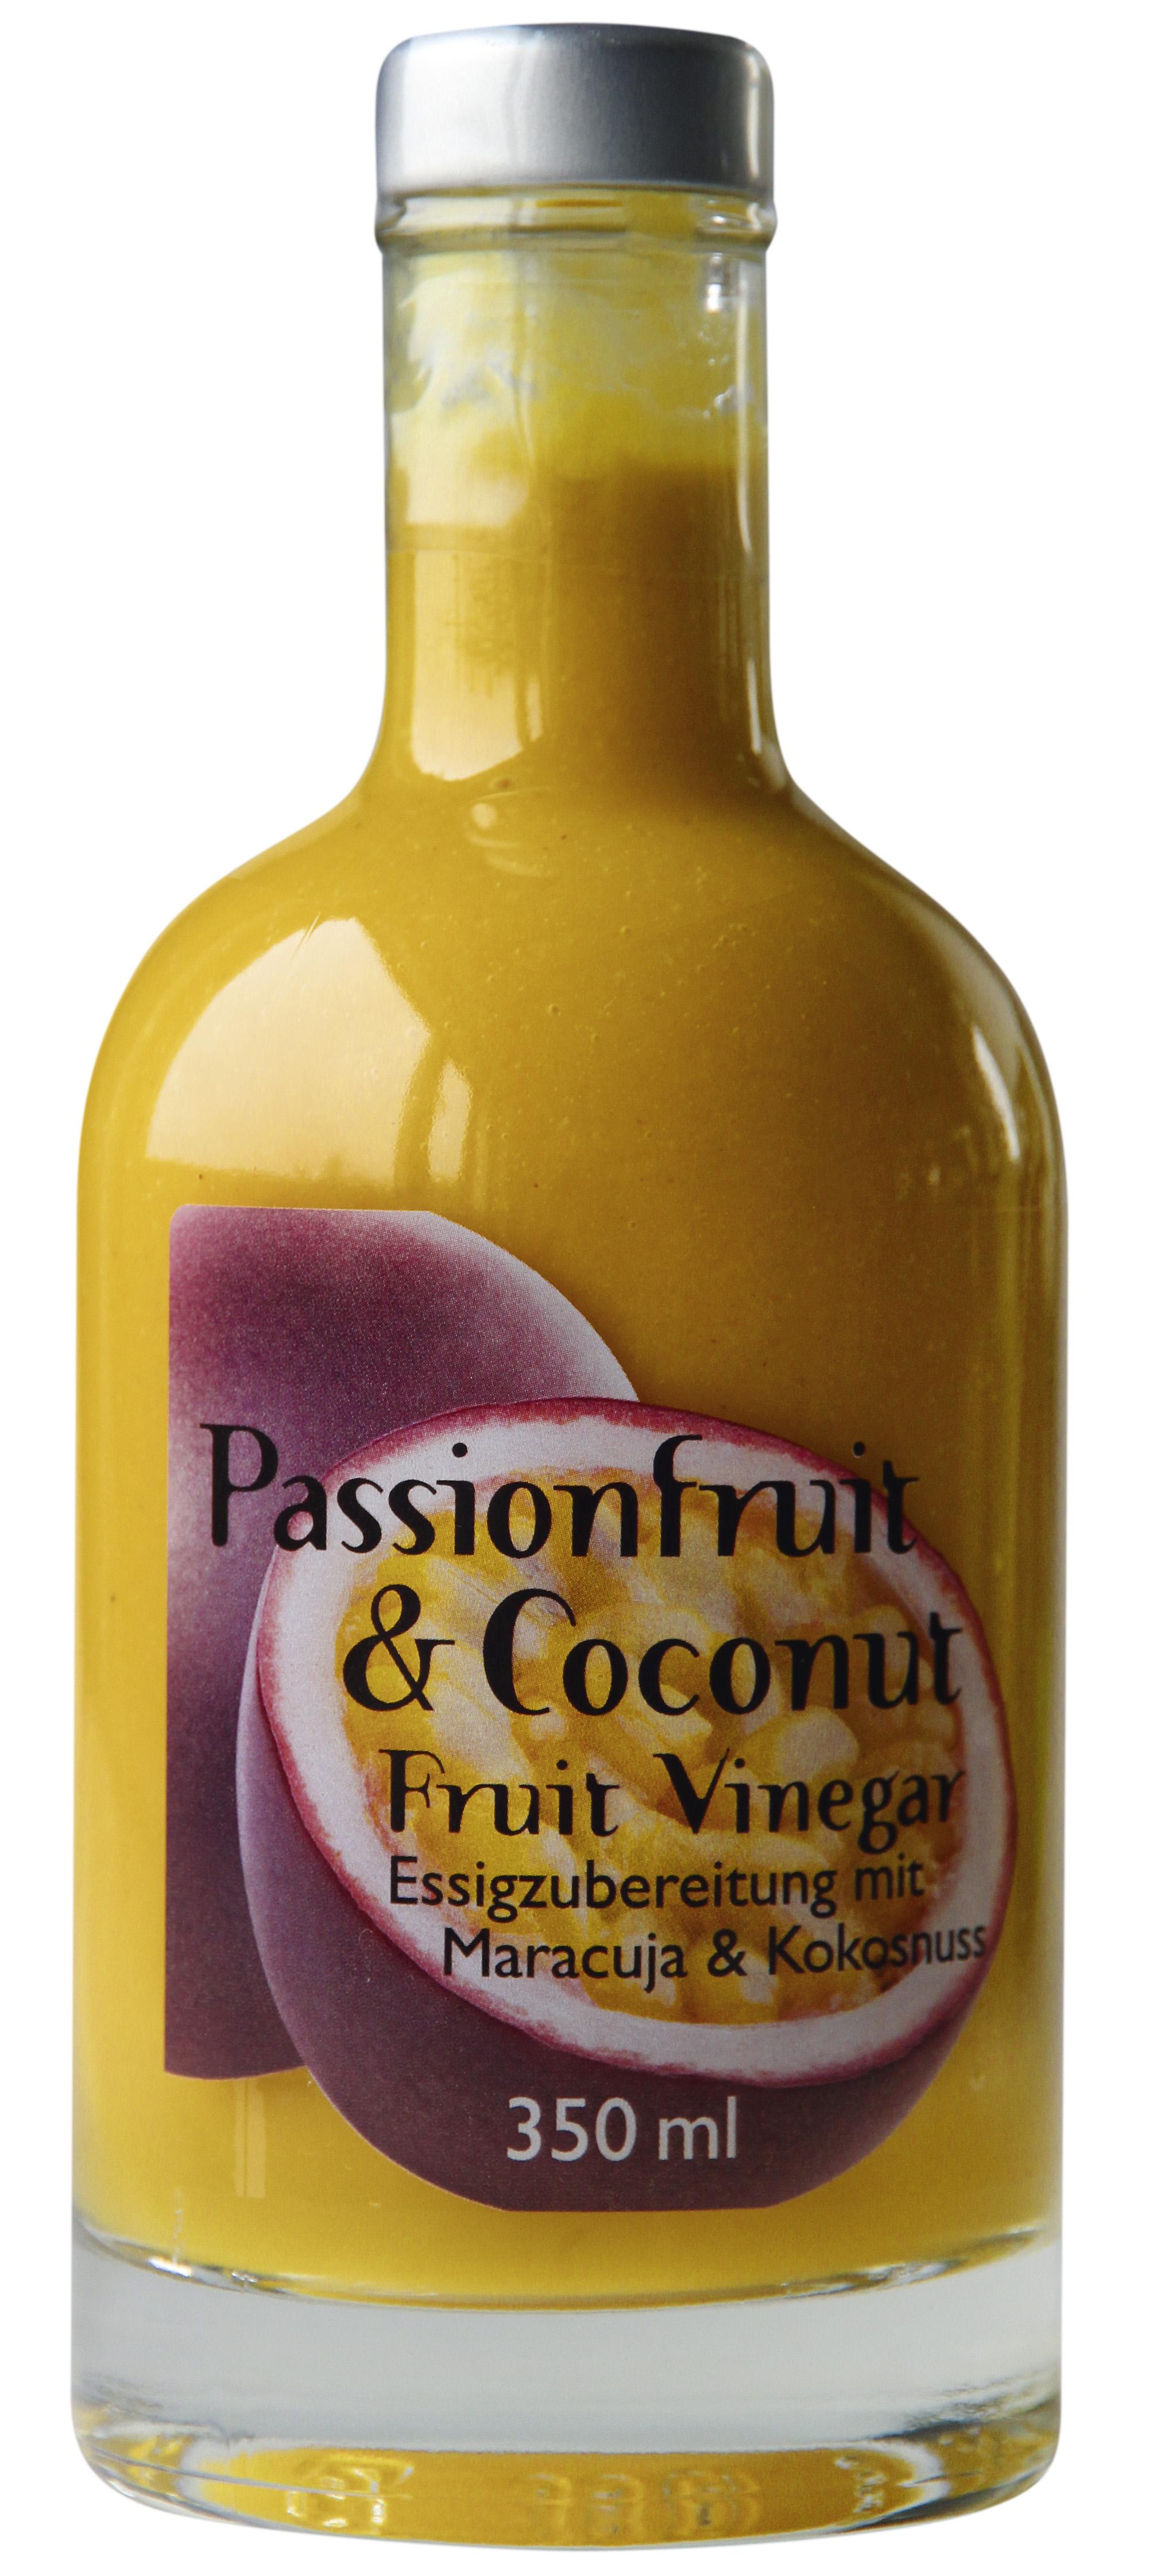 Passionfruit & Coconut Fruit Vinegar